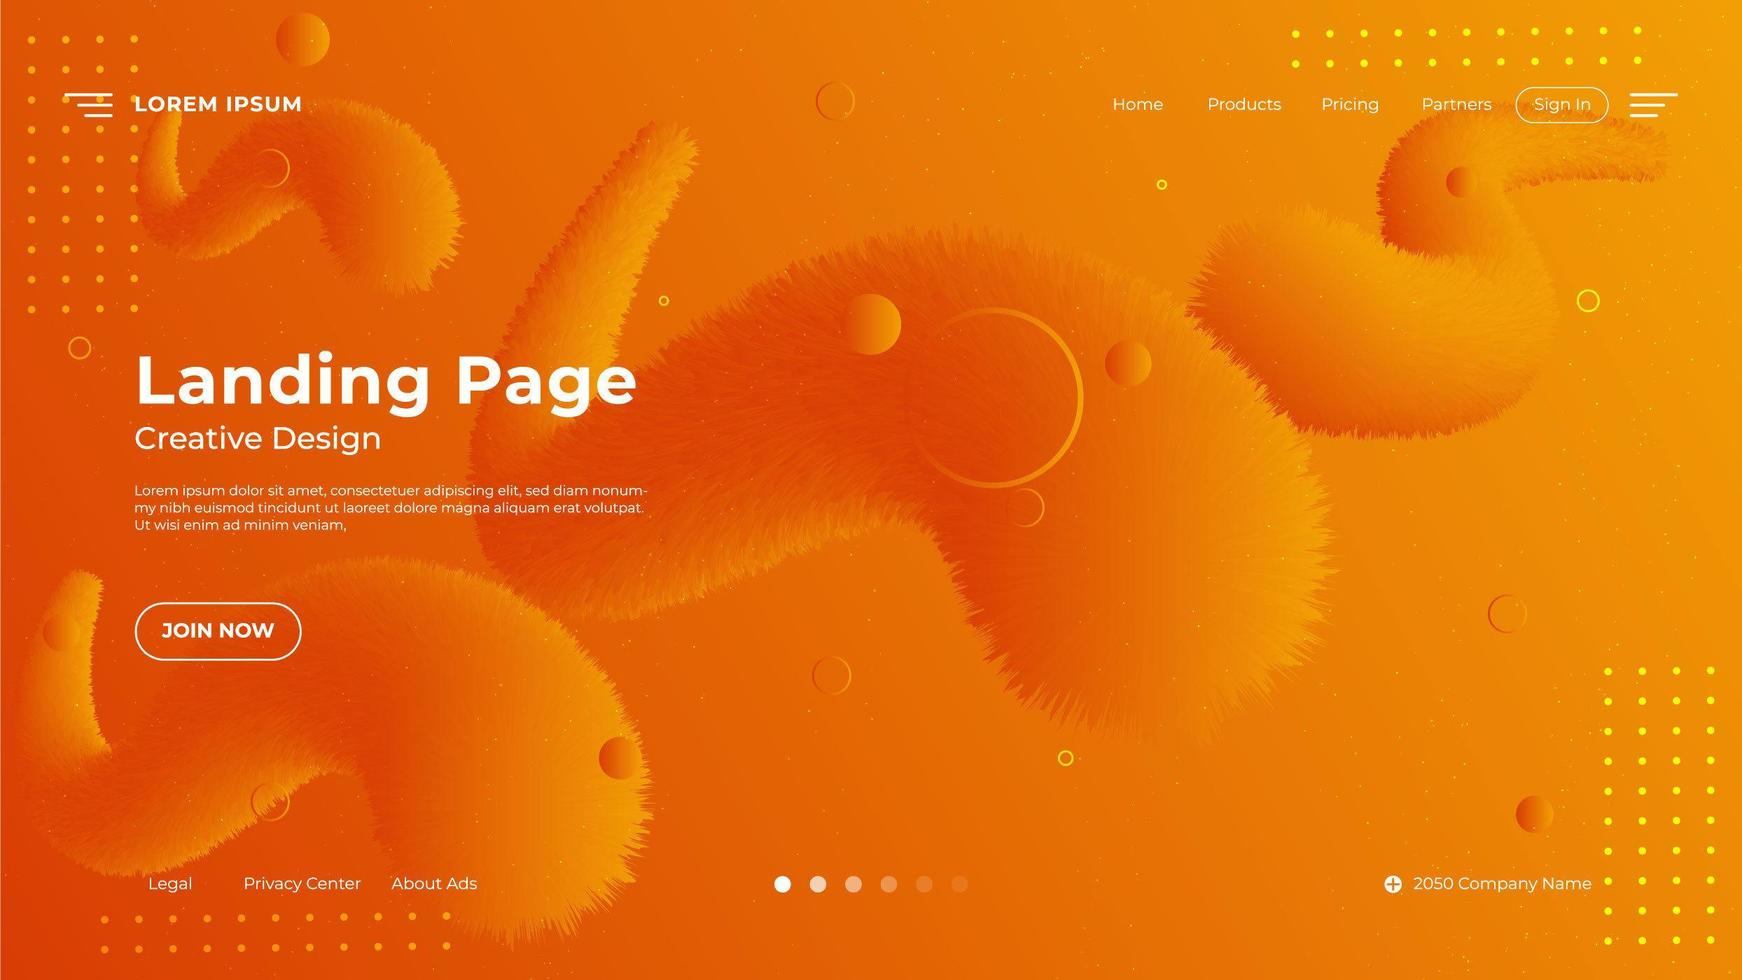 Abstract Orange Fluid Gradient Landing Page Background vector